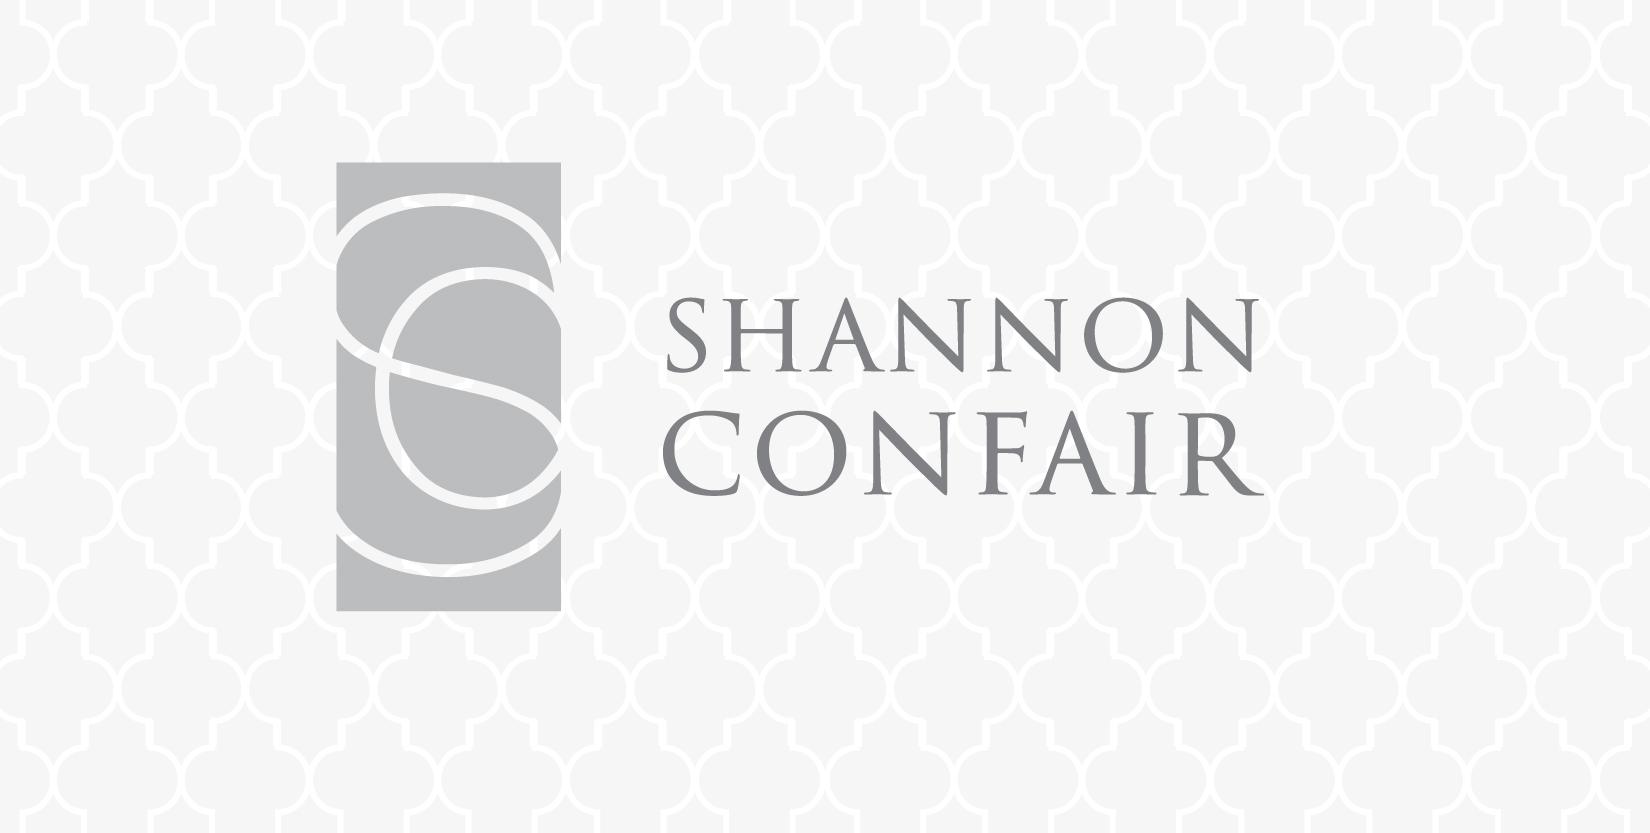 StephNE_LogoPortfolio_Shannon Confair 4.jpg